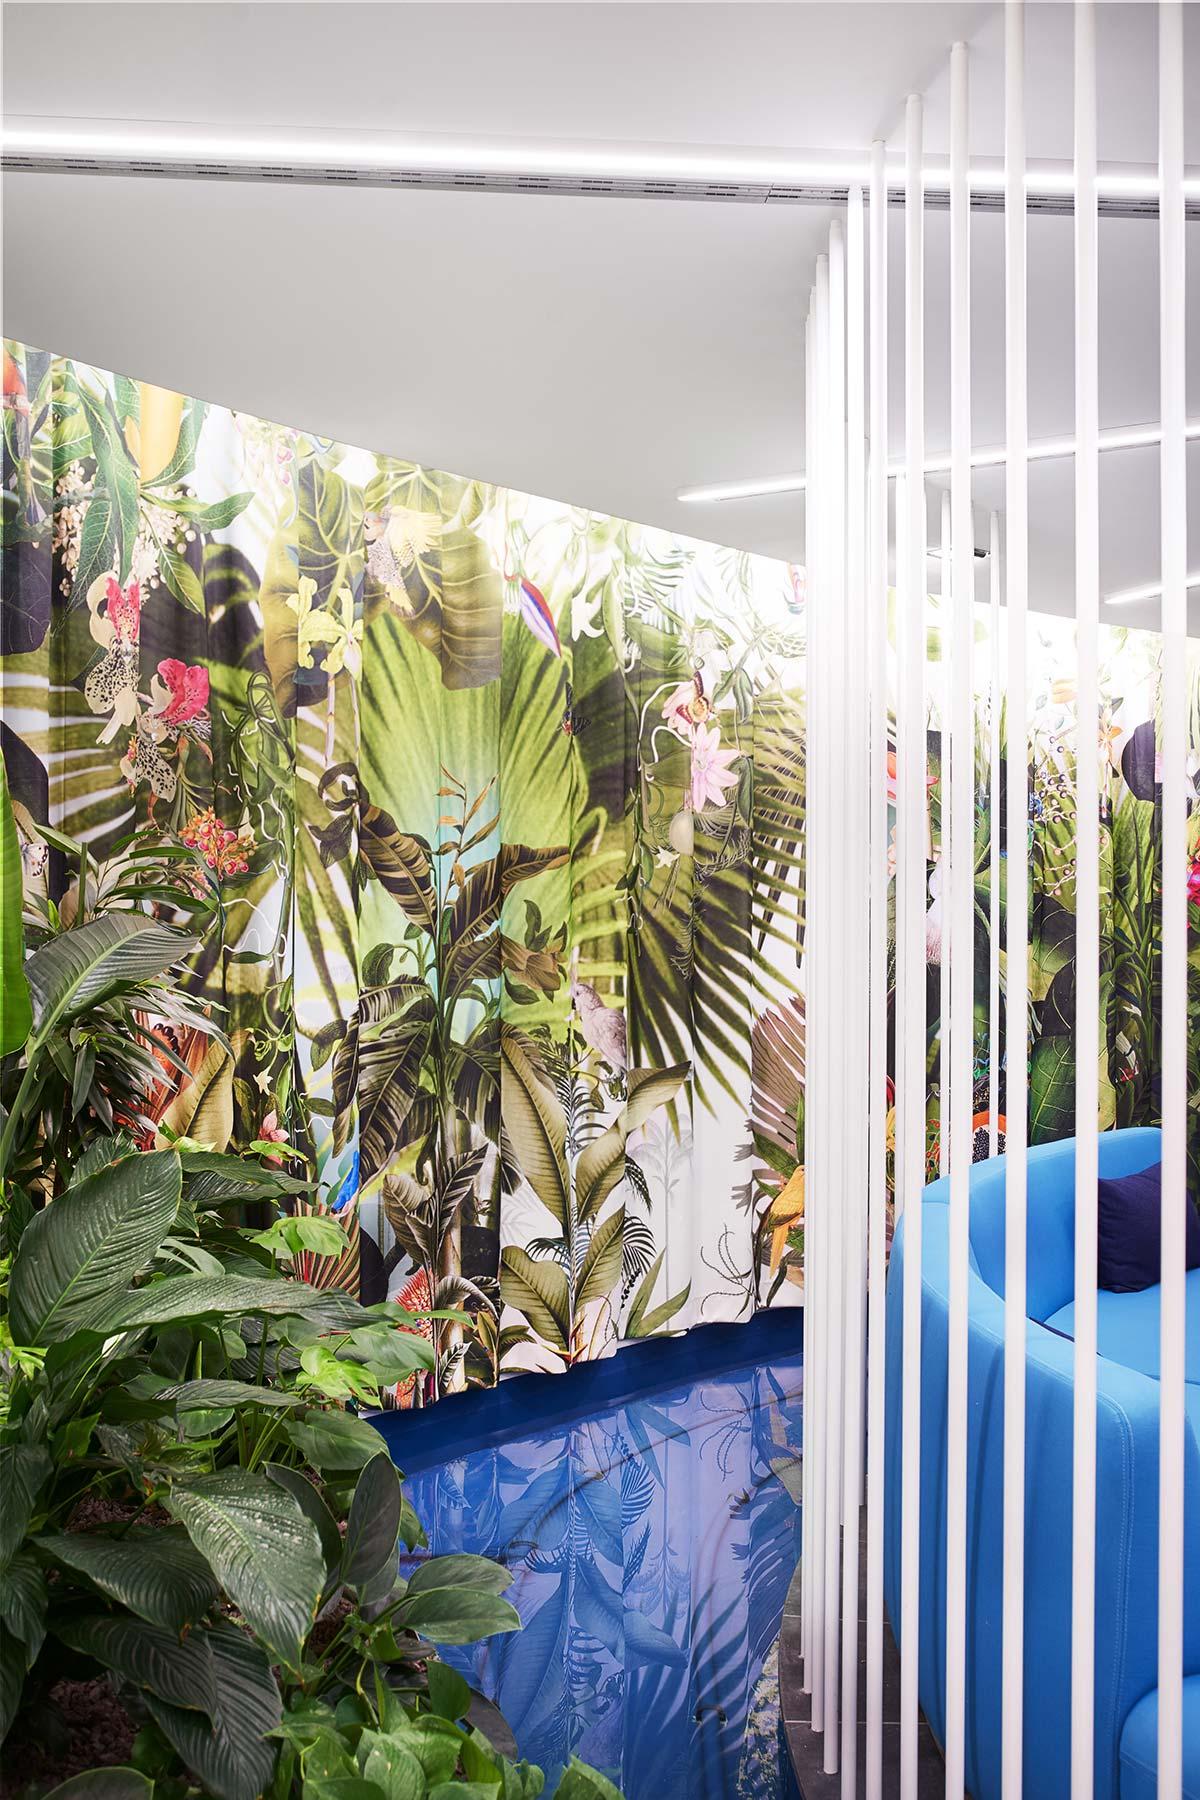 Roman Klis Design, Herrenberg, Germany